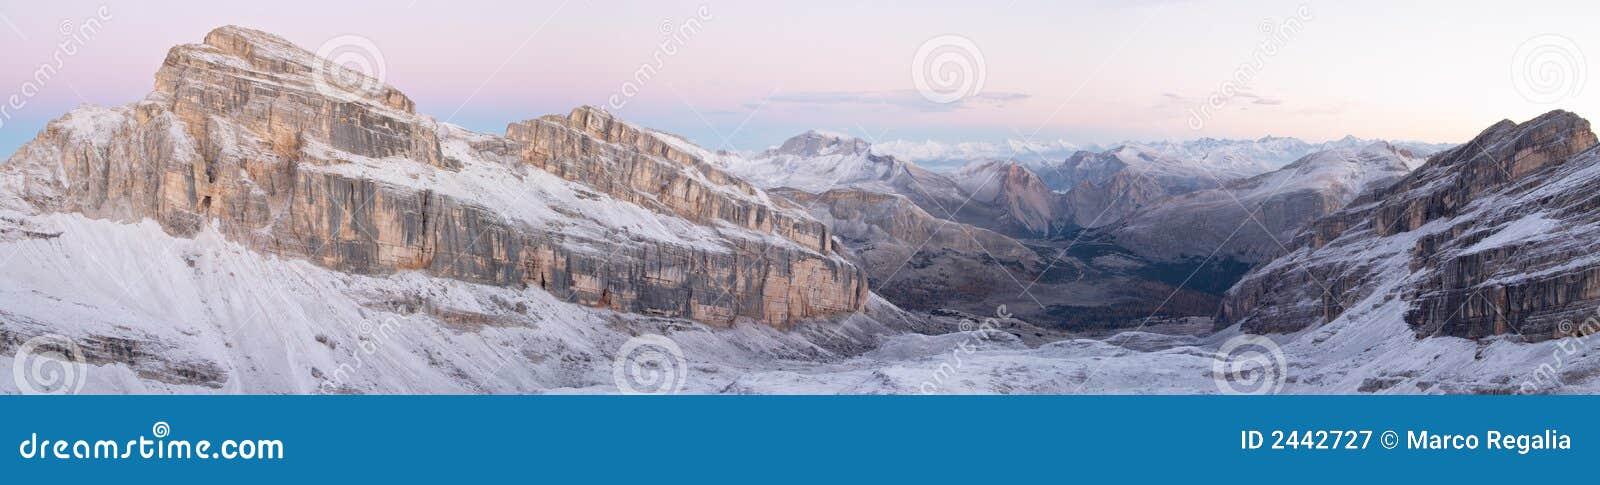 панорама доломитов